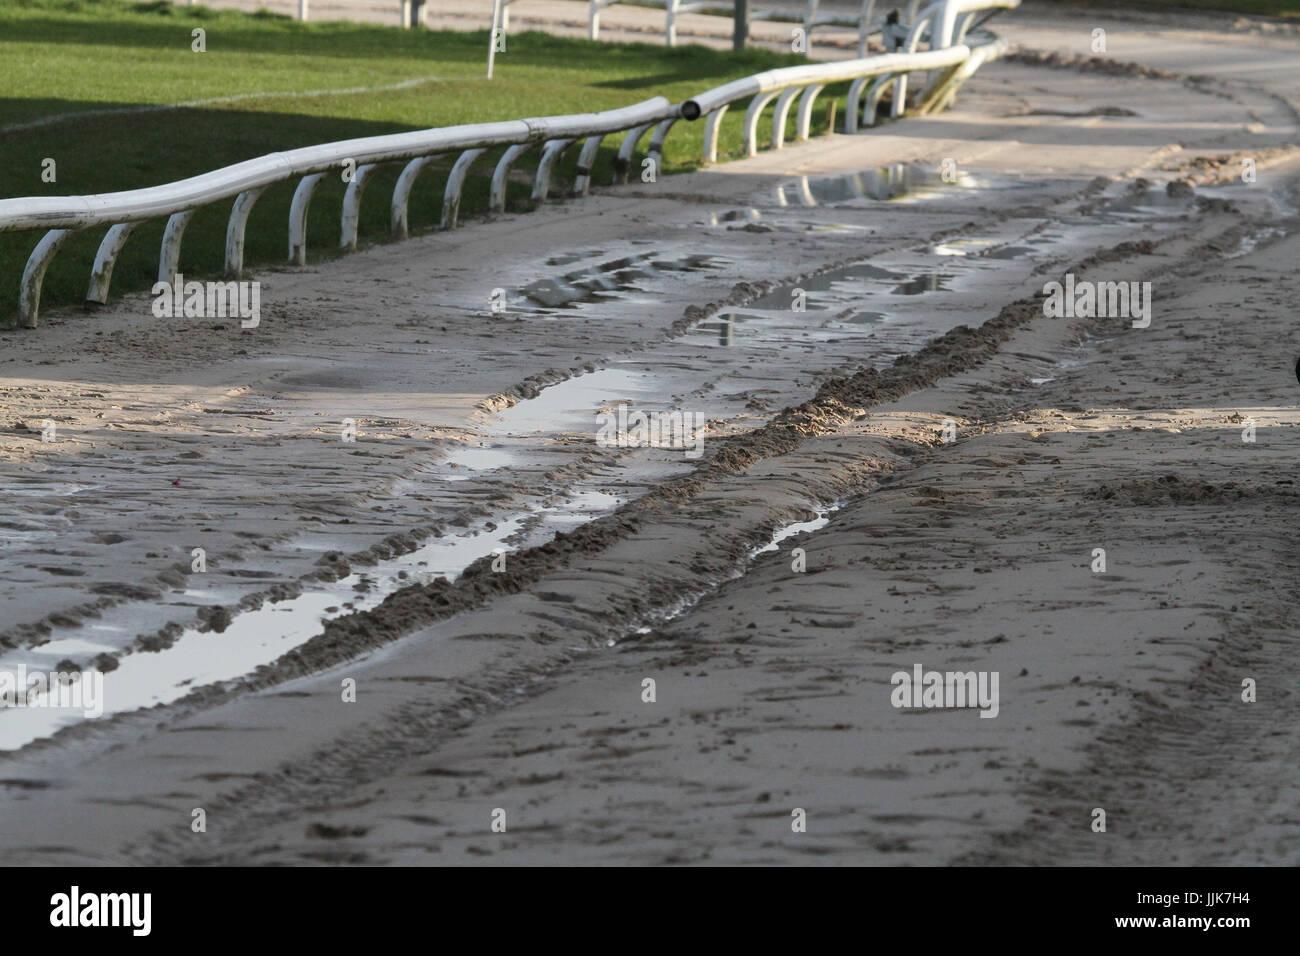 Waterlogged greyhound track requiring work after heavy rain. Stock Photo